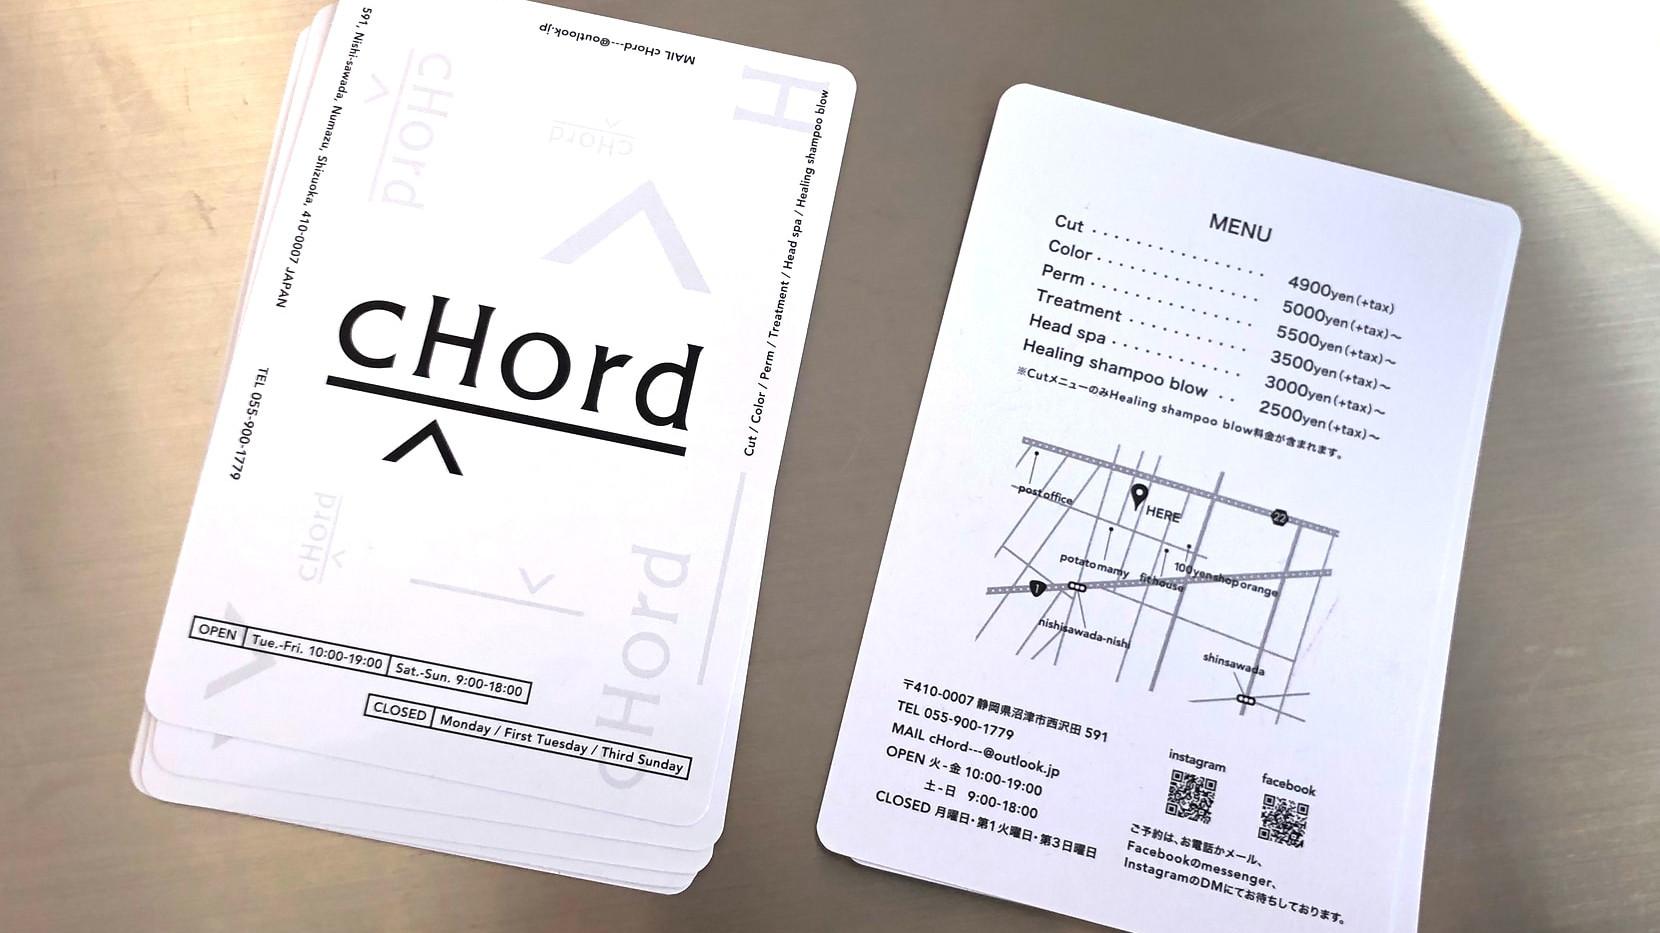 cHord7-min.jpg